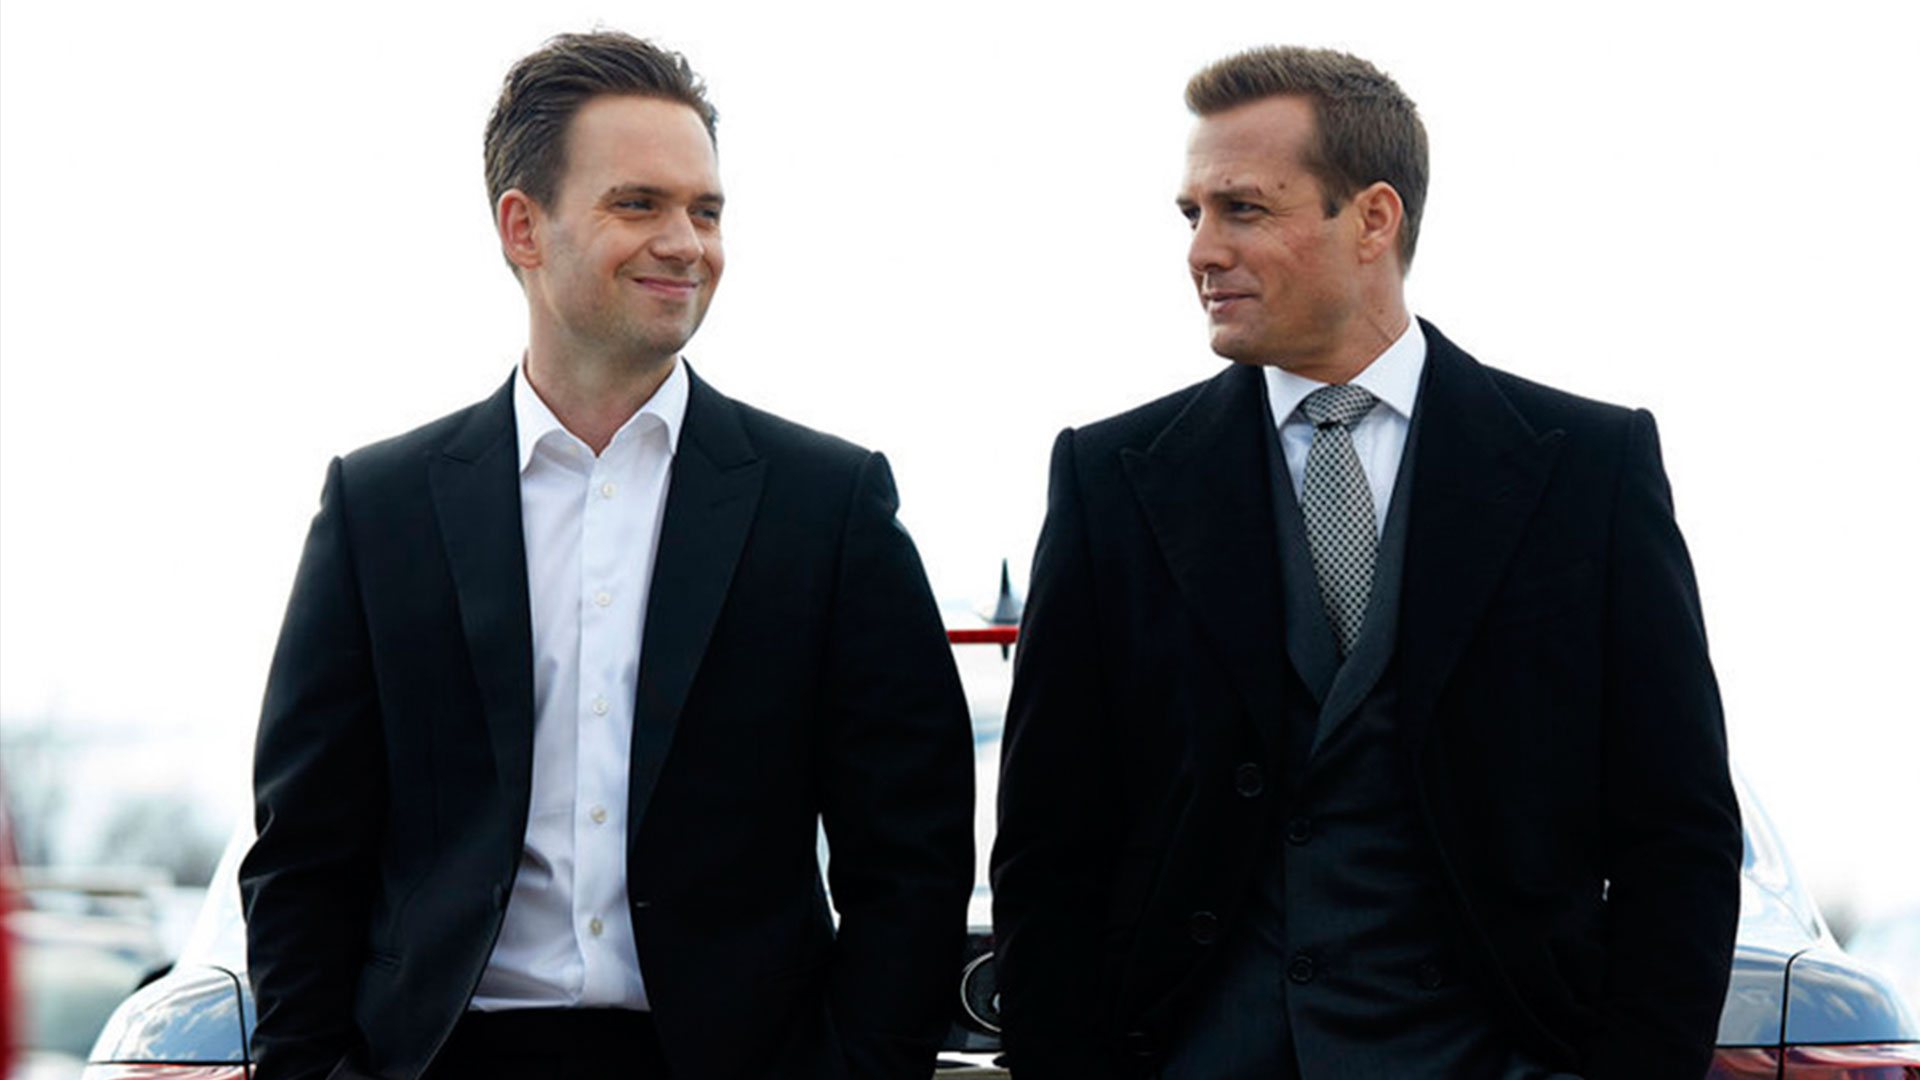 suits season 6 episode 11 free online